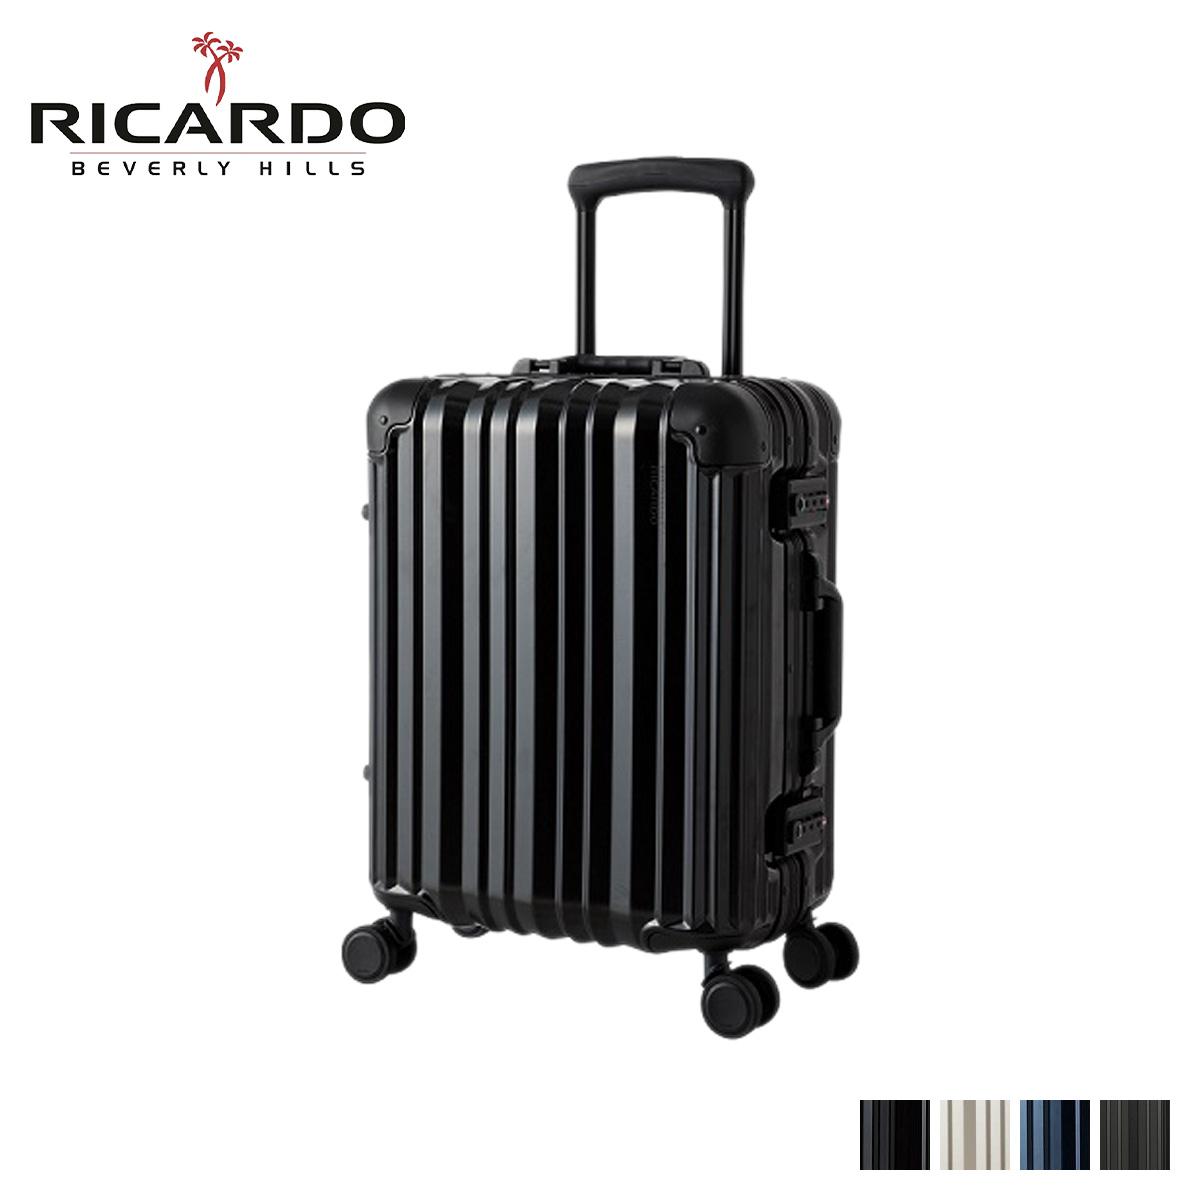 RICARDO リカルド エルロン スーツケース キャリーケース キャリーバッグ メンズ 37L AILERON ブラック グレー ネイビー 黒 AIV-19-4WB [4/13 新入荷]